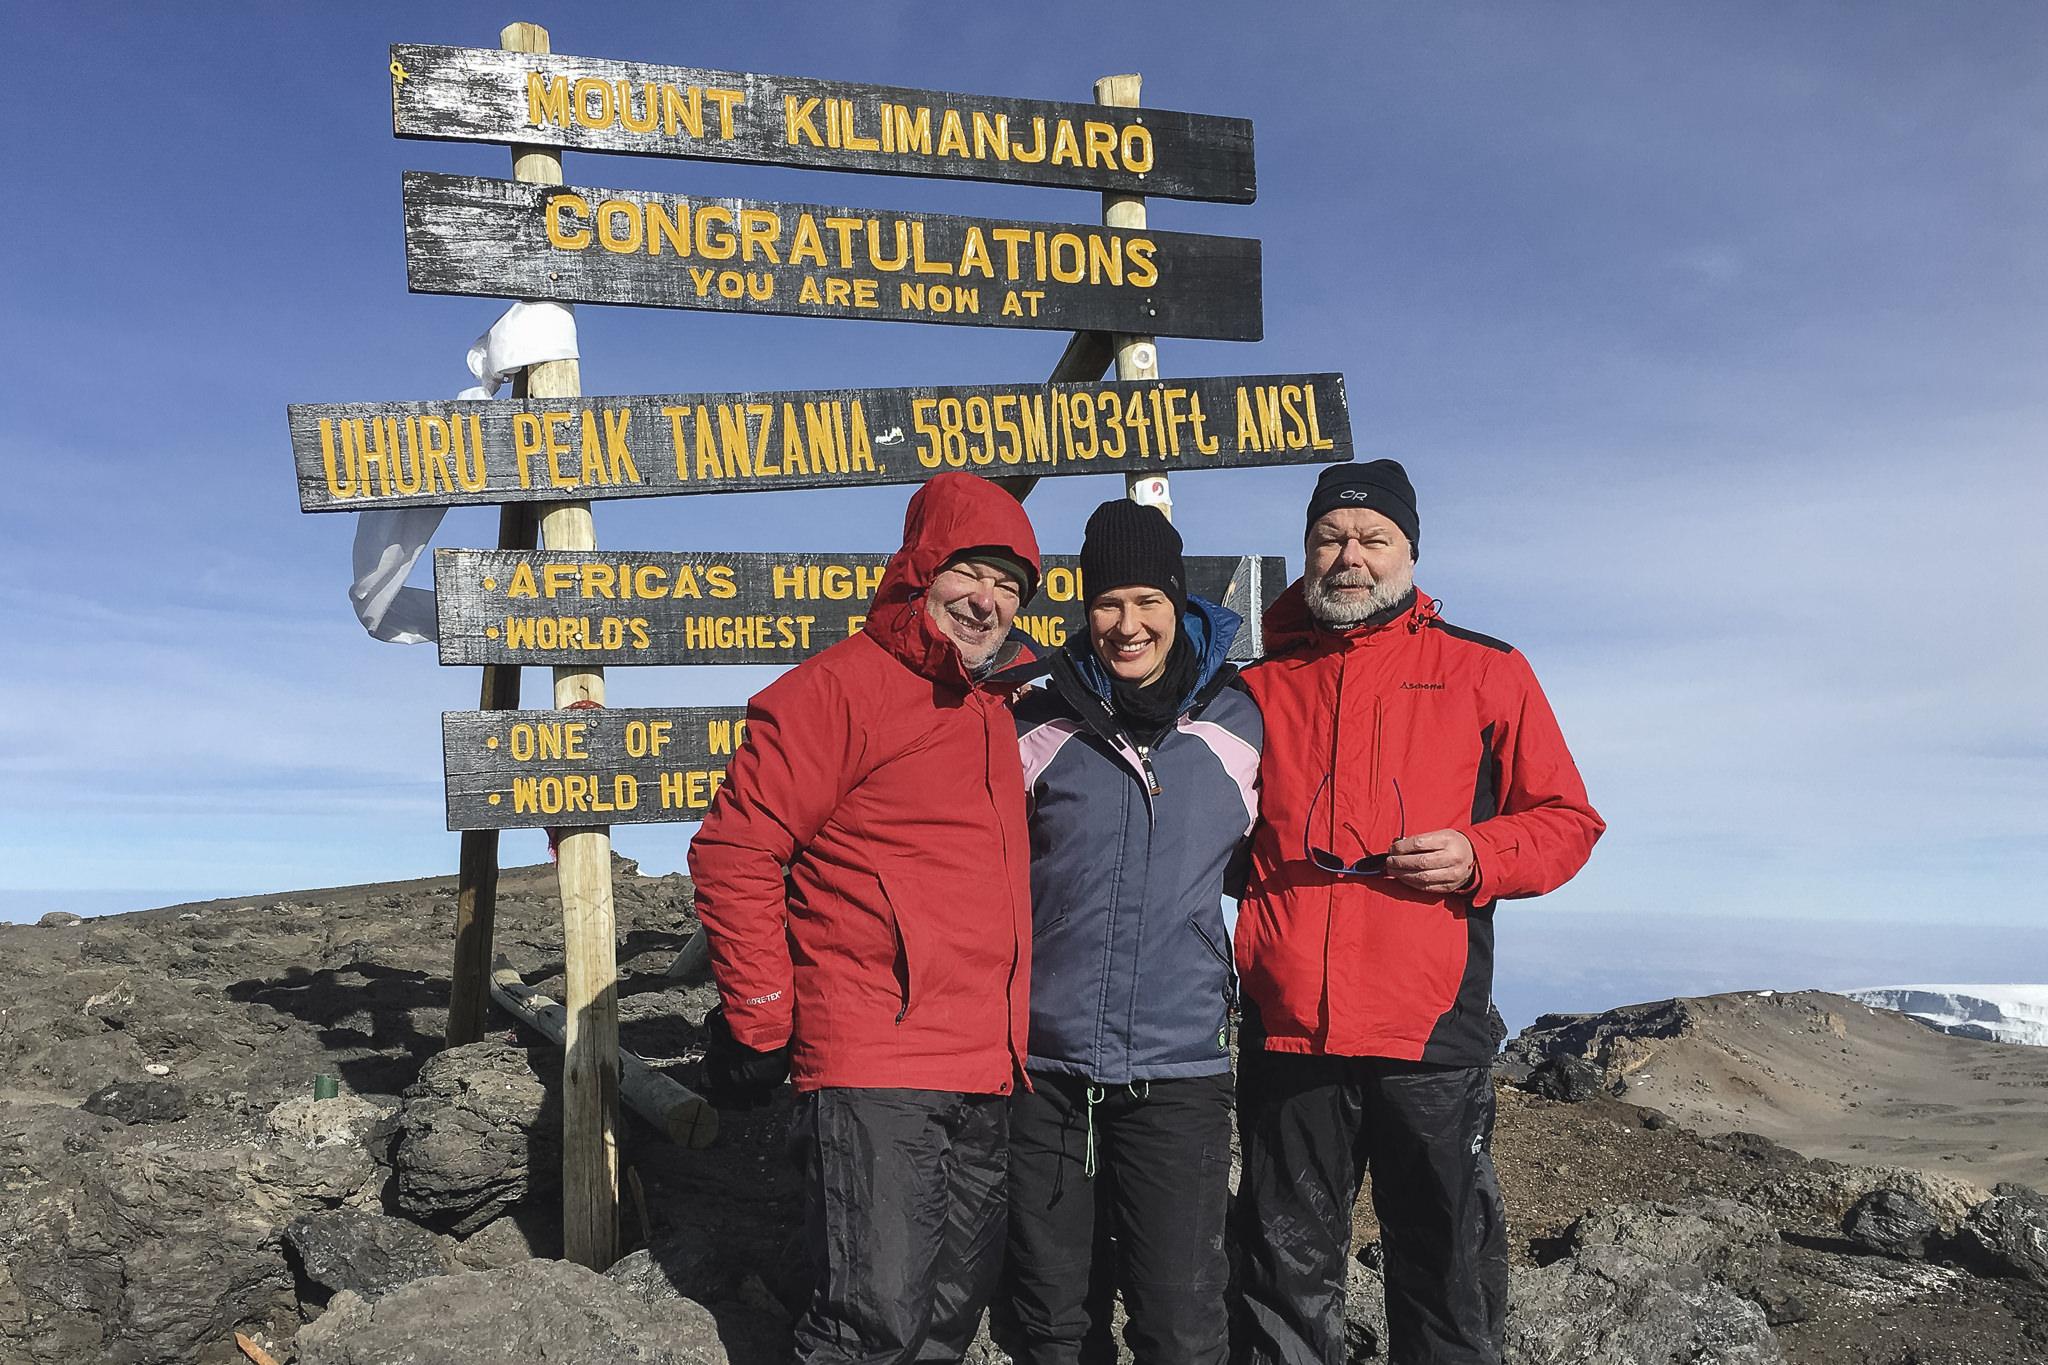 Kilimanjaro - 228